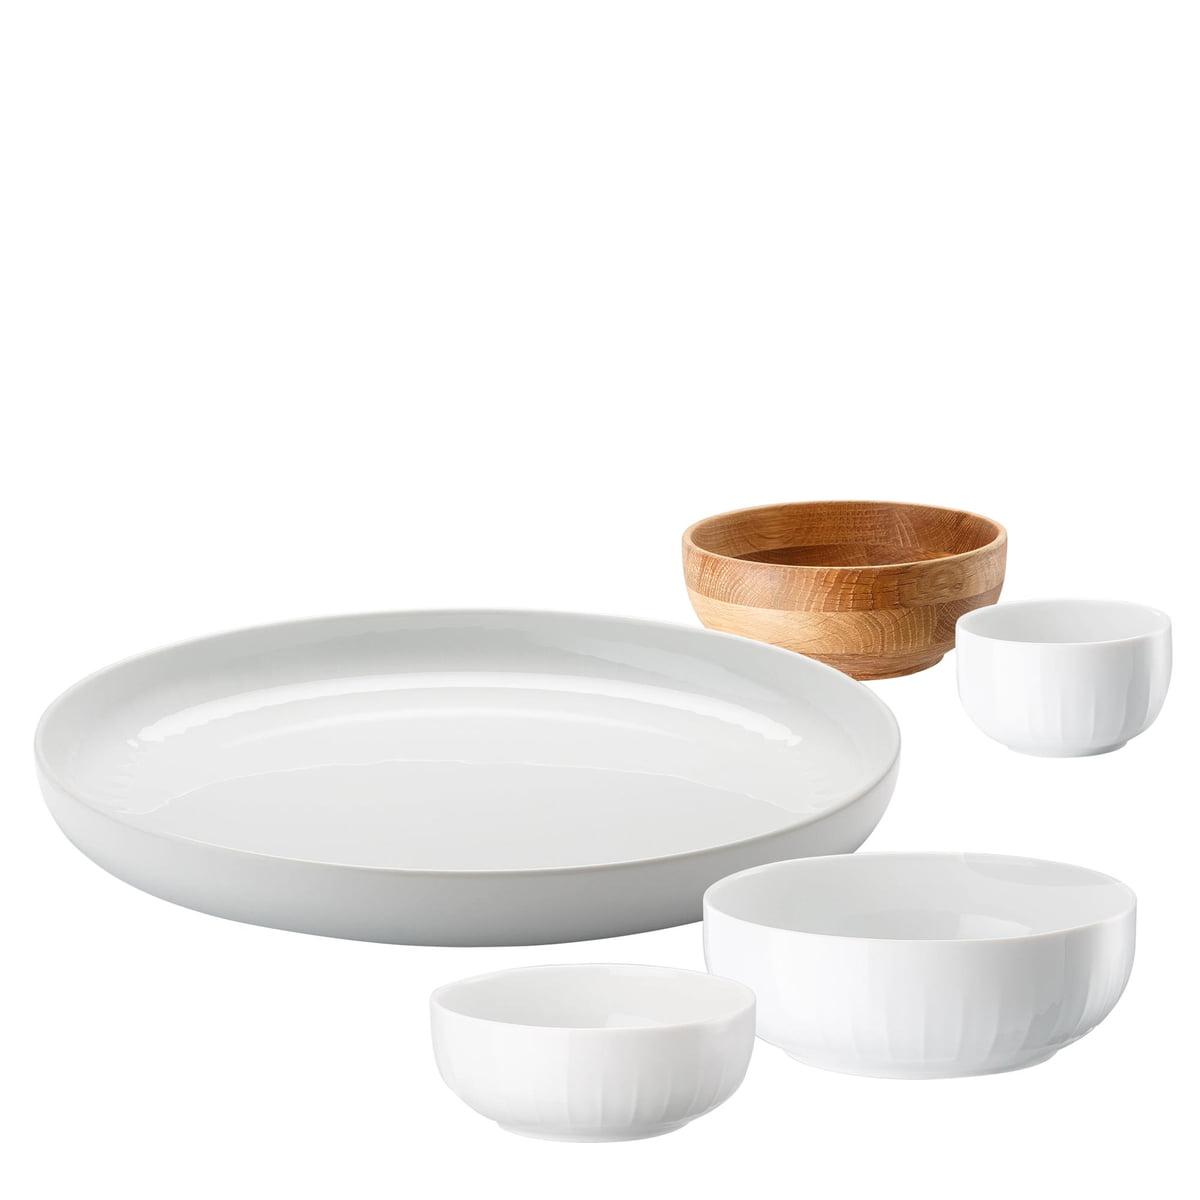 Arzberg - Joyn Dinnerware Set (5 pcs) in White  sc 1 st  Connox Interior Design Shop & White Dinnerware Set Joyn by Arzberg | Connox